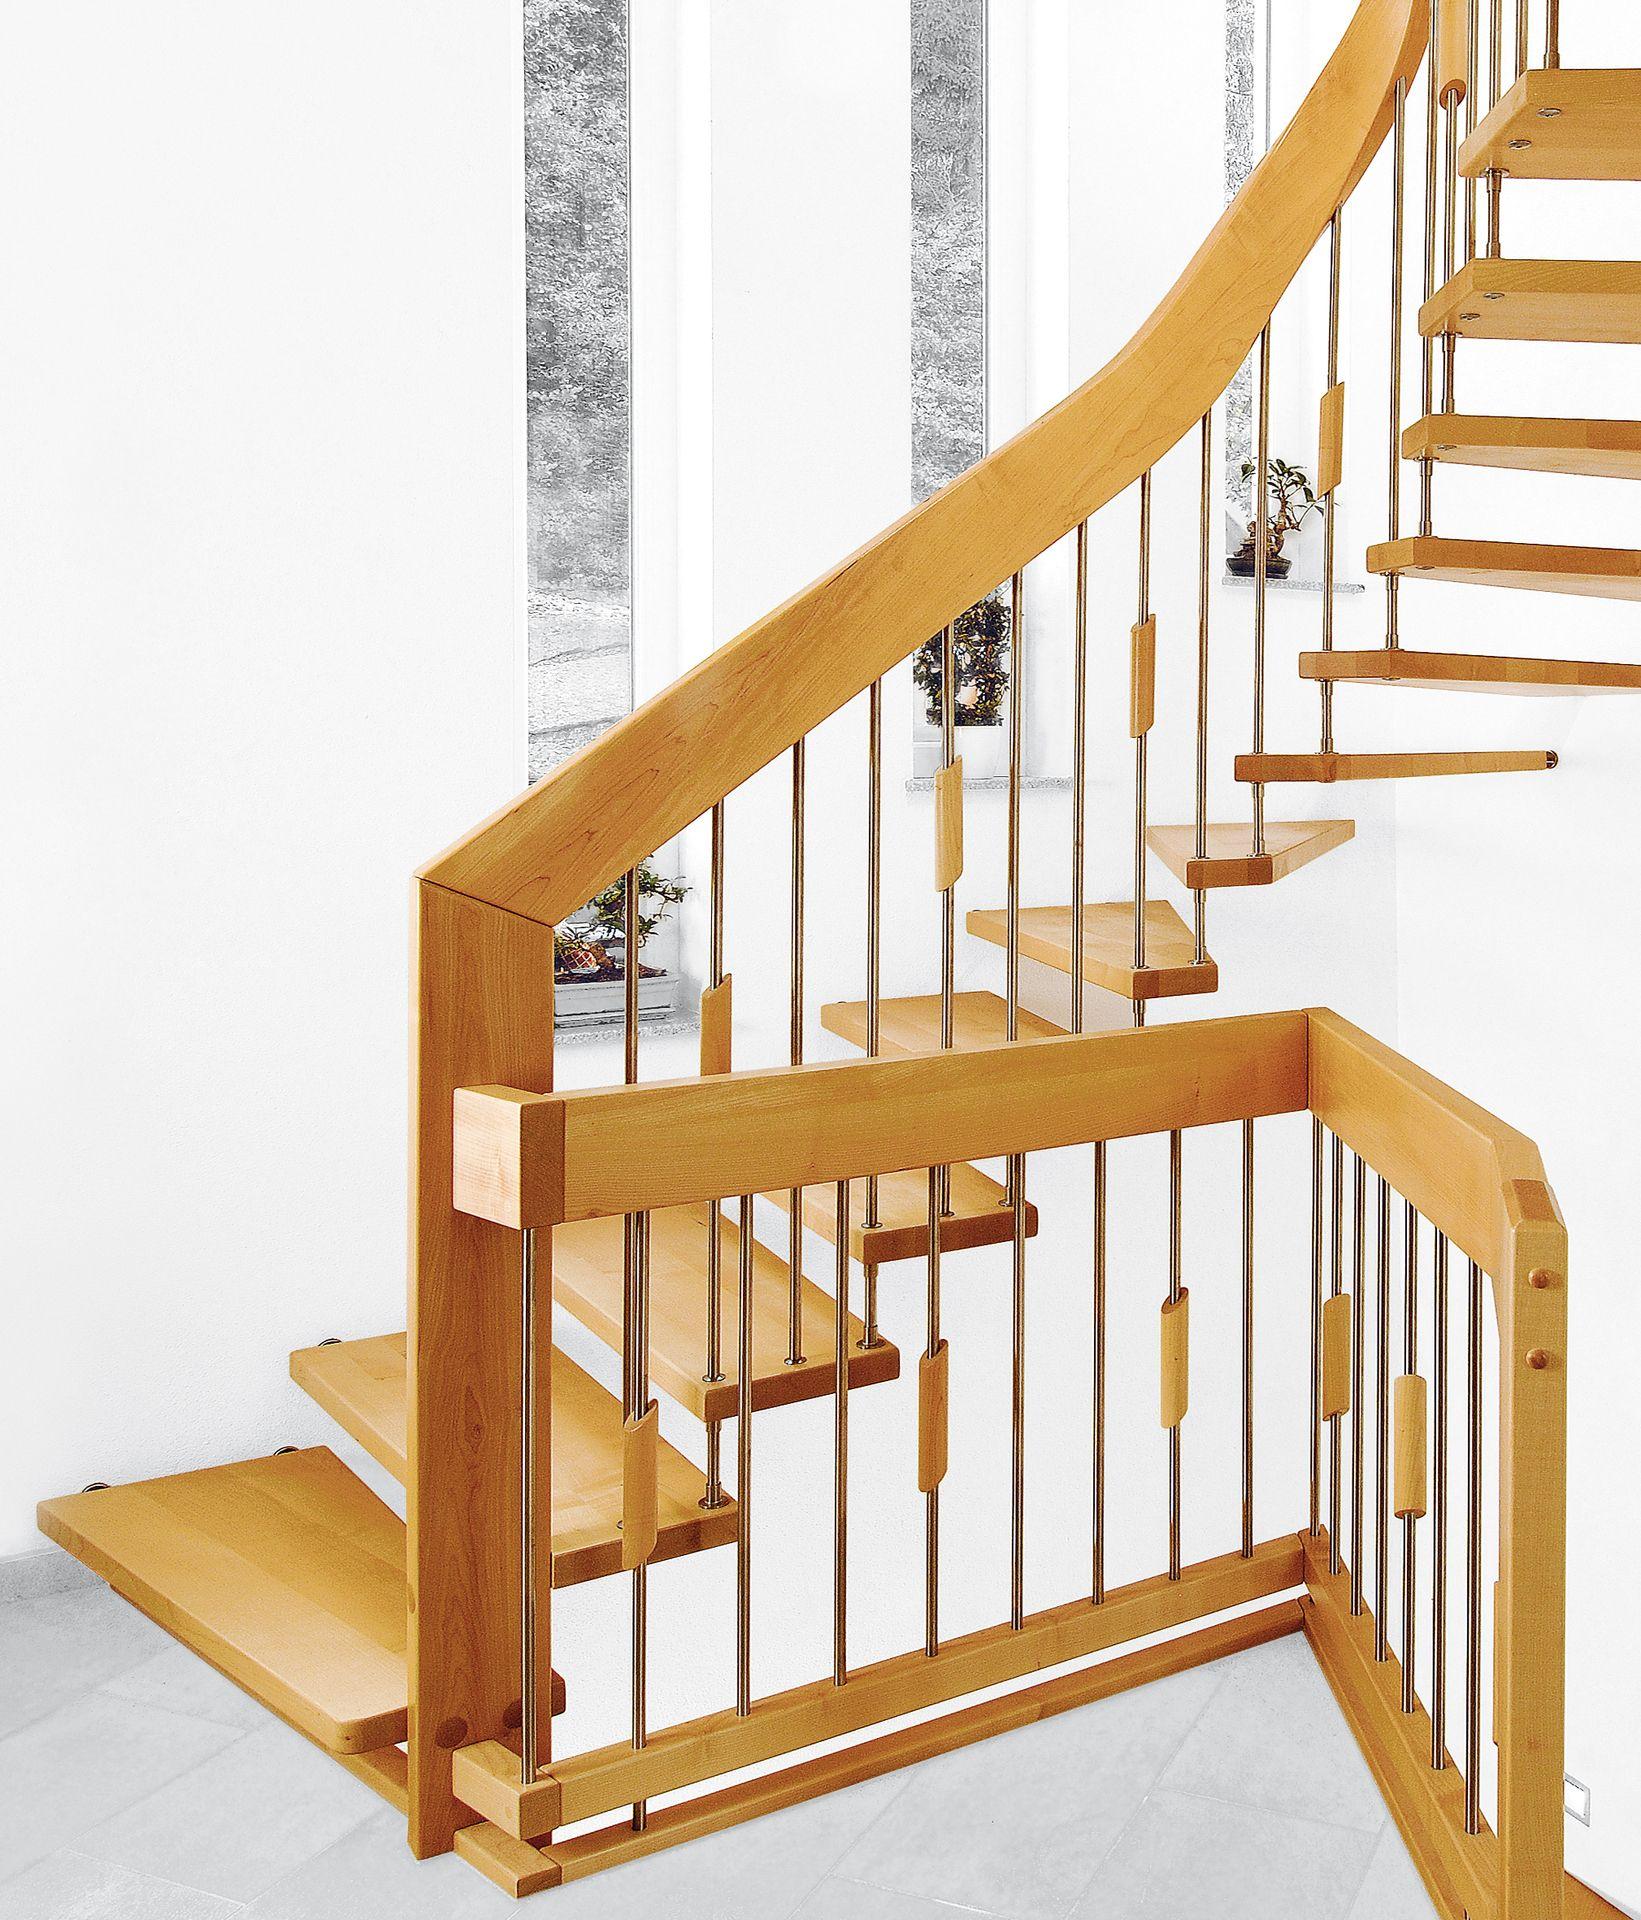 fuchs treppen ais. Black Bedroom Furniture Sets. Home Design Ideas